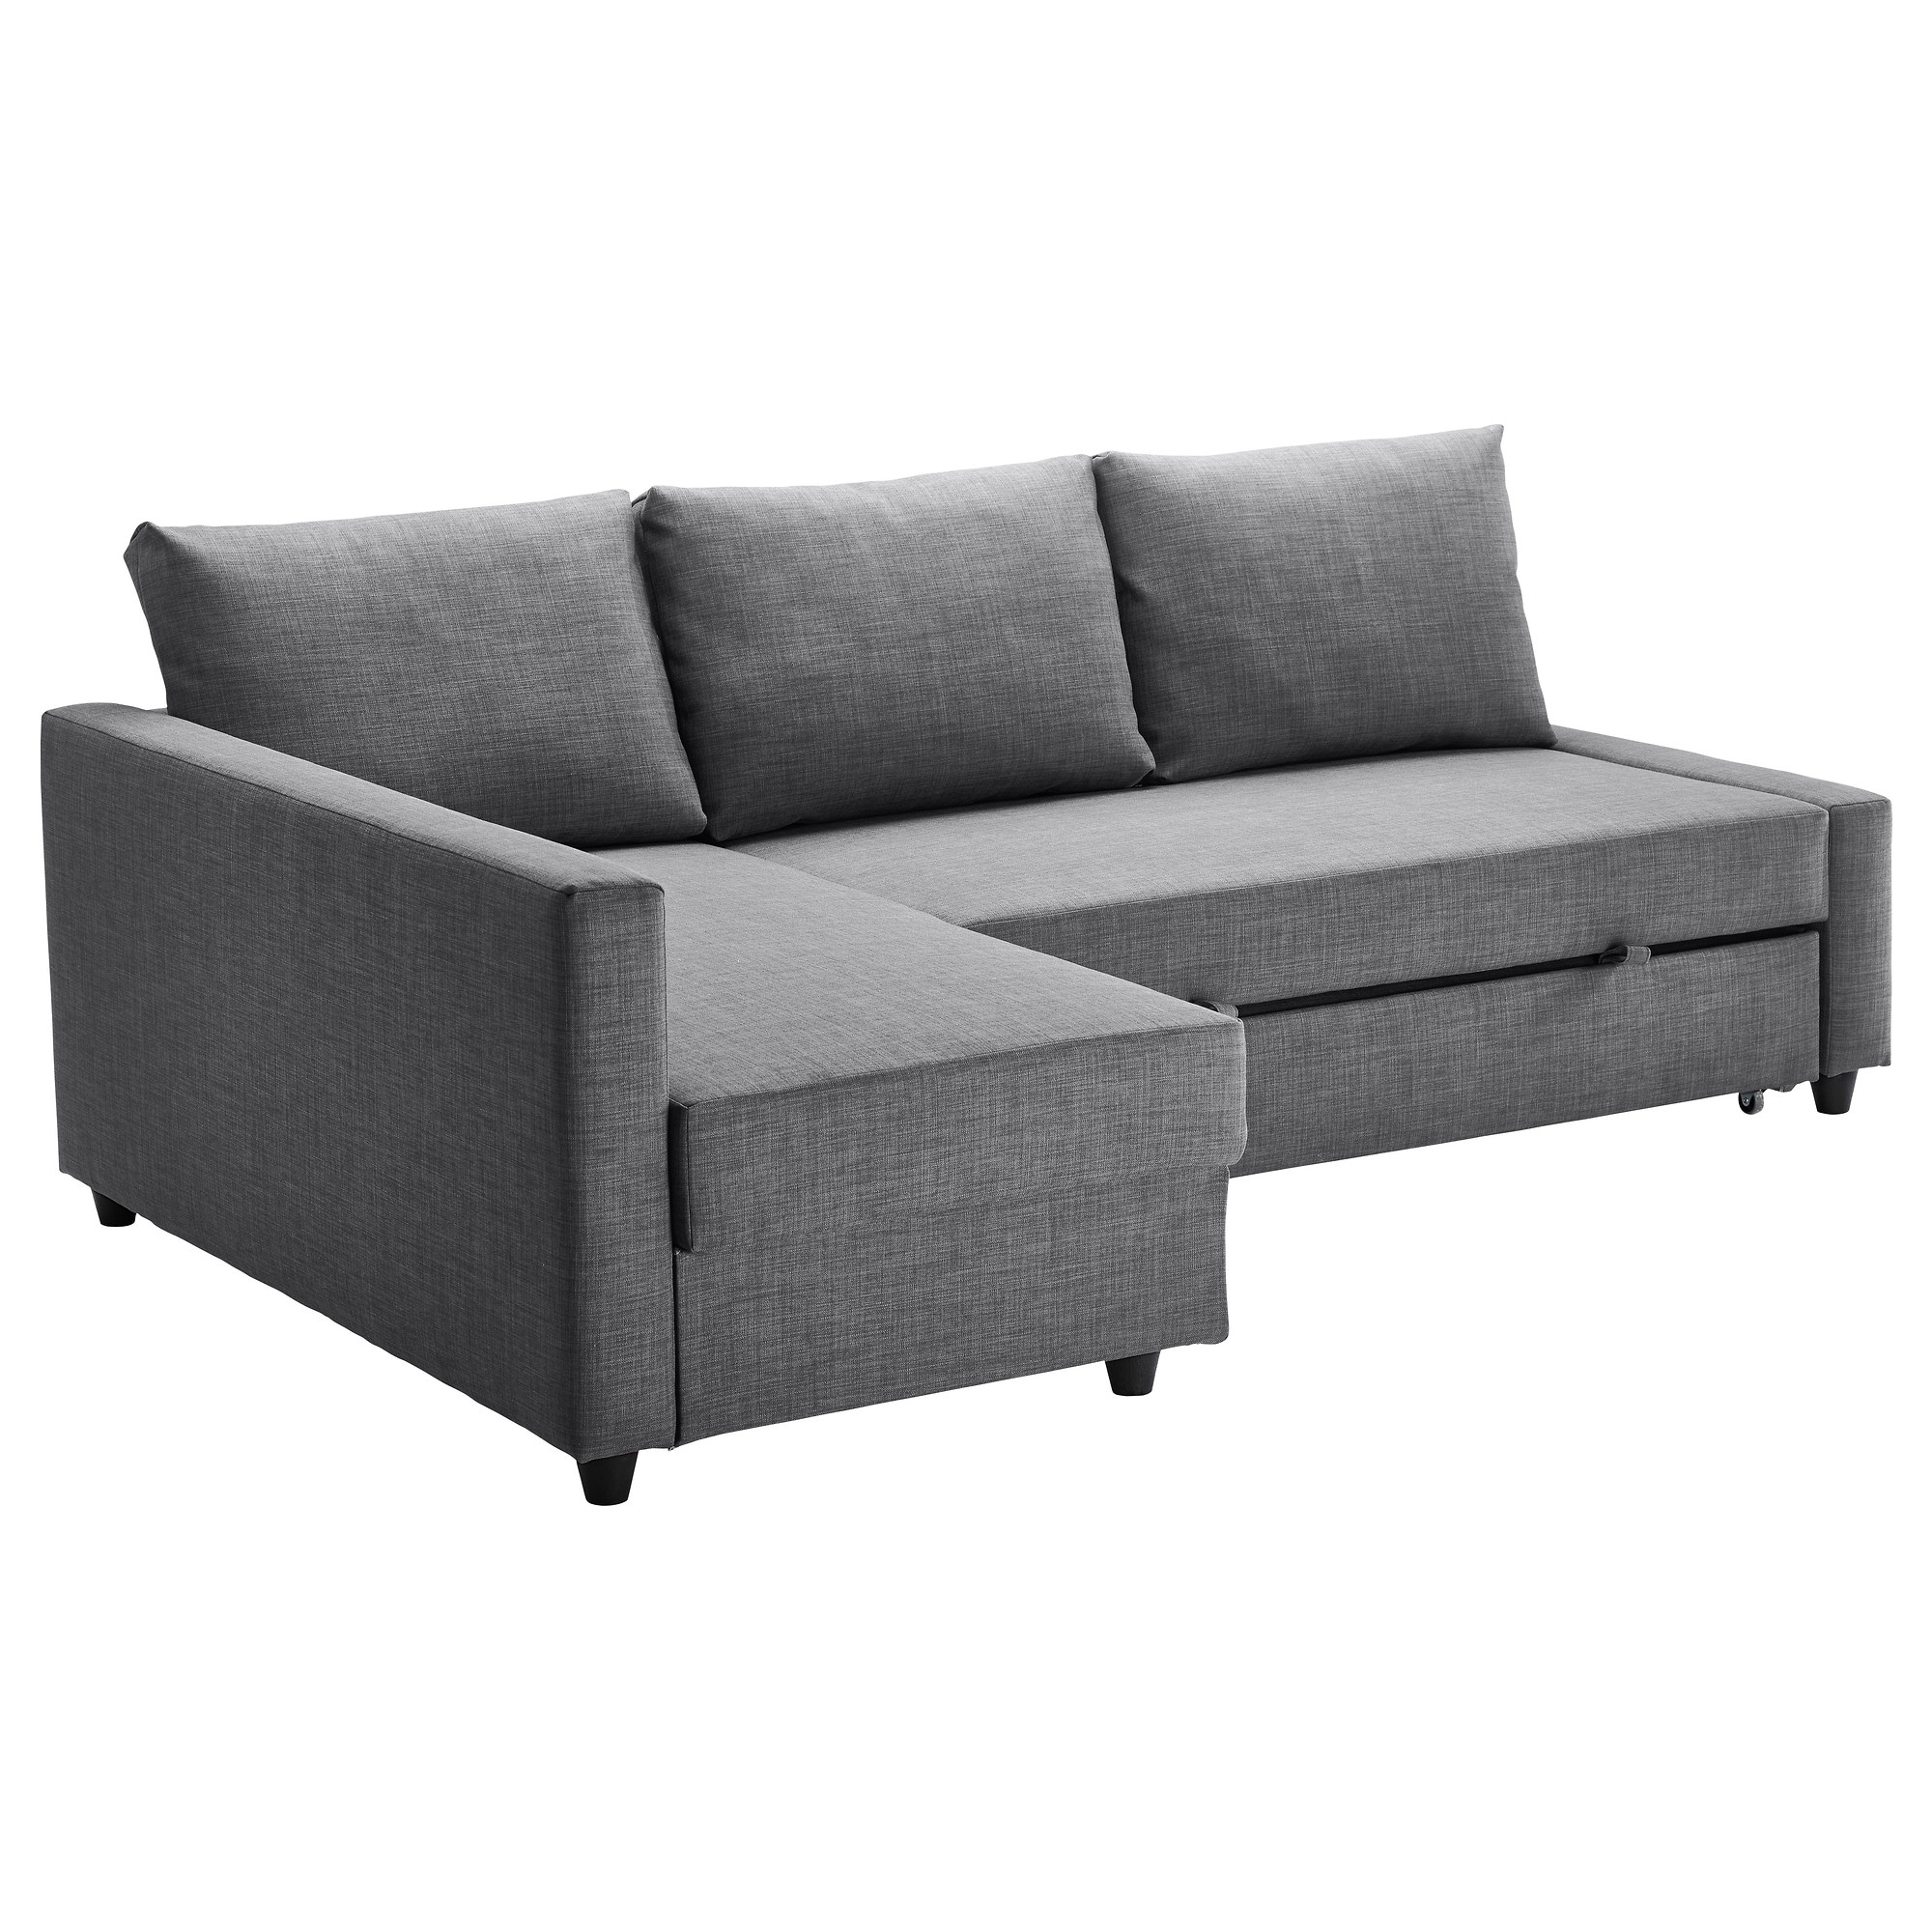 Sofa Cama De Ikea Ipdd Friheten sofà Cama Esquina Con Almacenaje Skiftebo Gris Oscuro Ikea